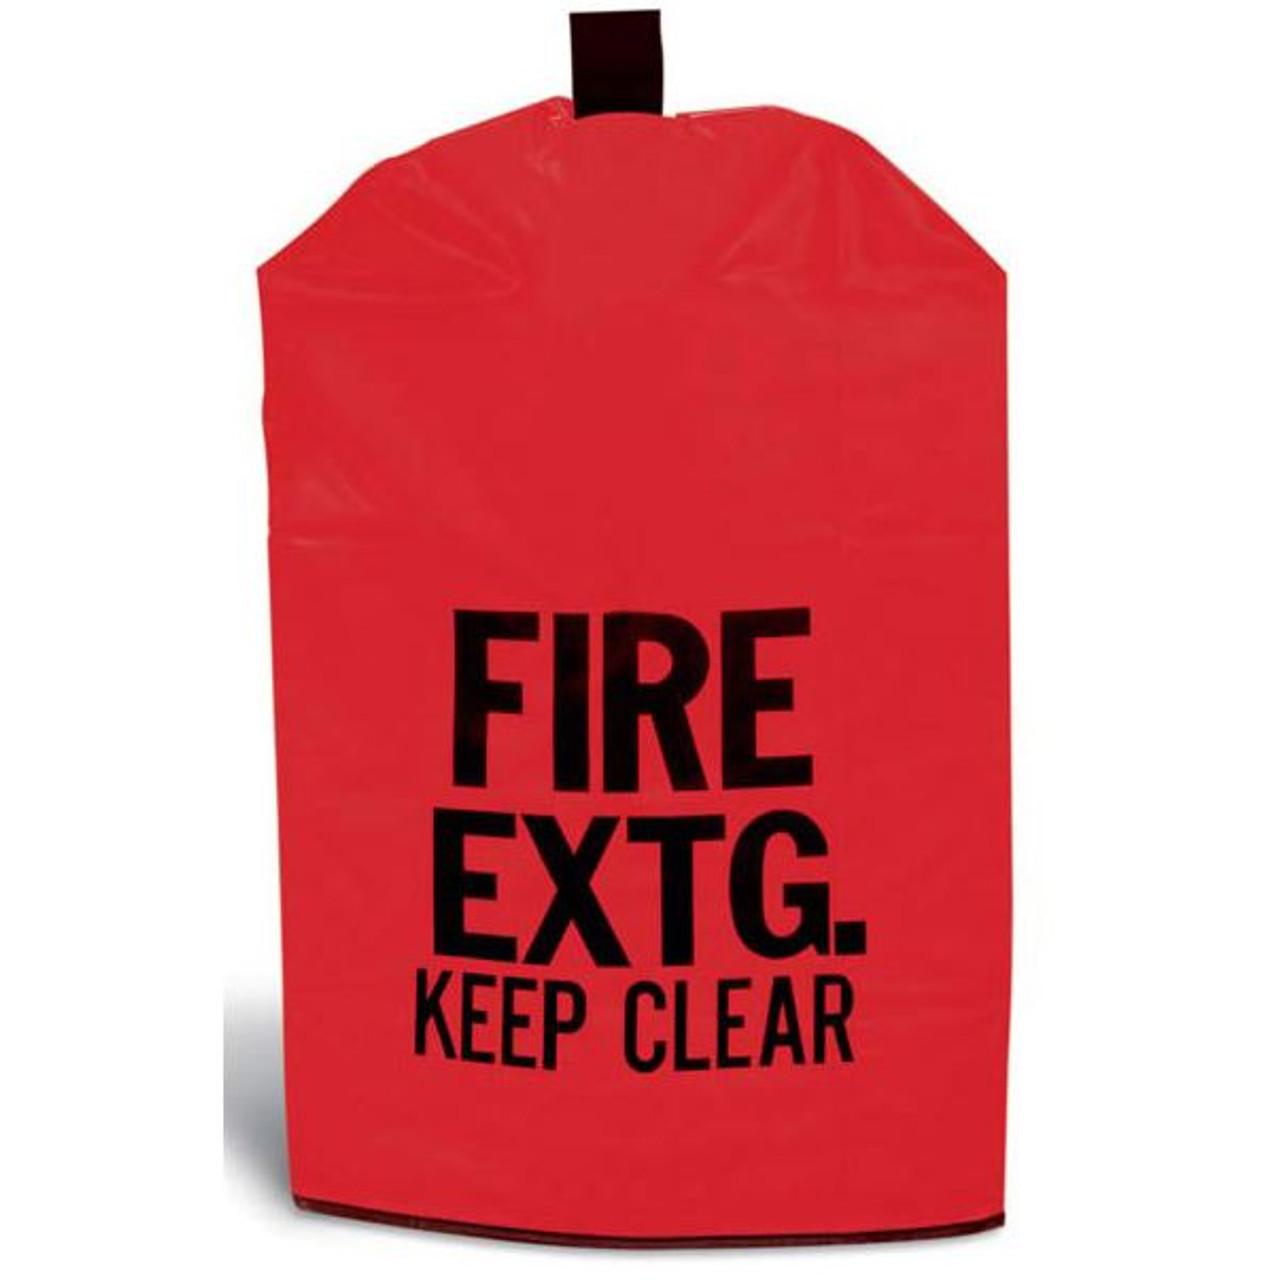 "FEC 7 - Small Heavy-Duty Extinguisher Cover 20"" x 11.5"""